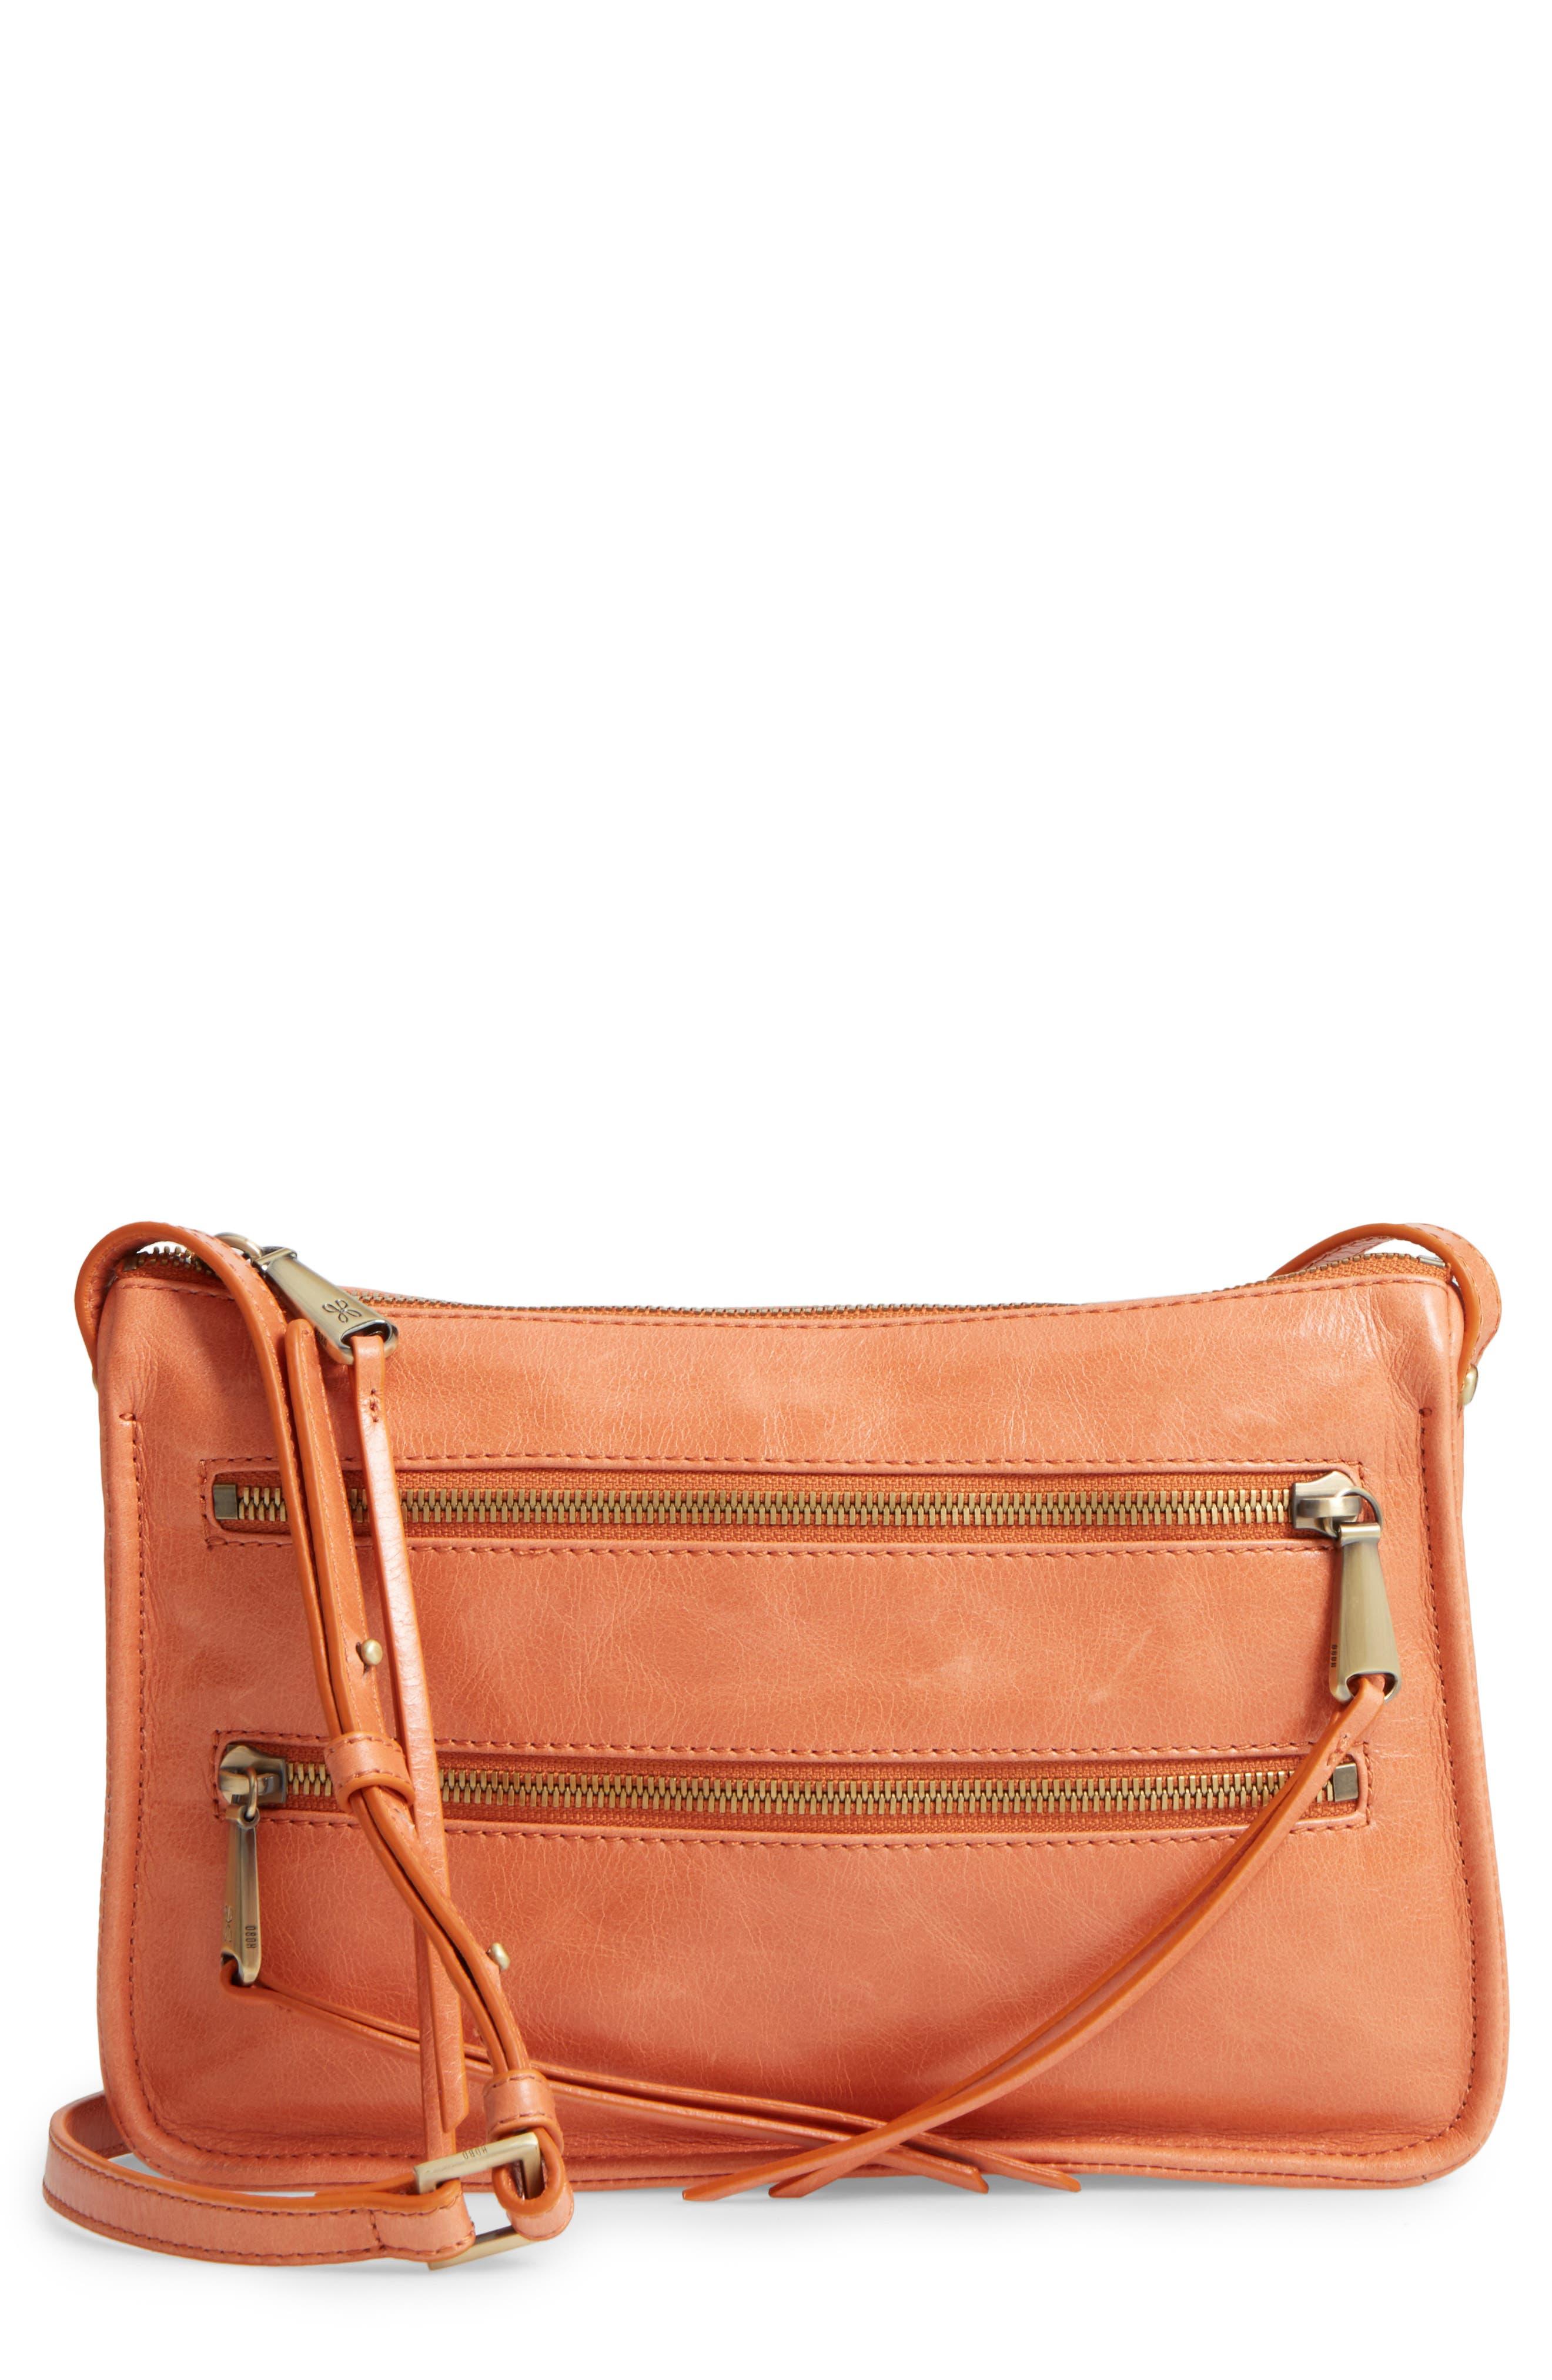 Alternate Image 1 Selected - Hobo Mission Leather Crossbody Bag